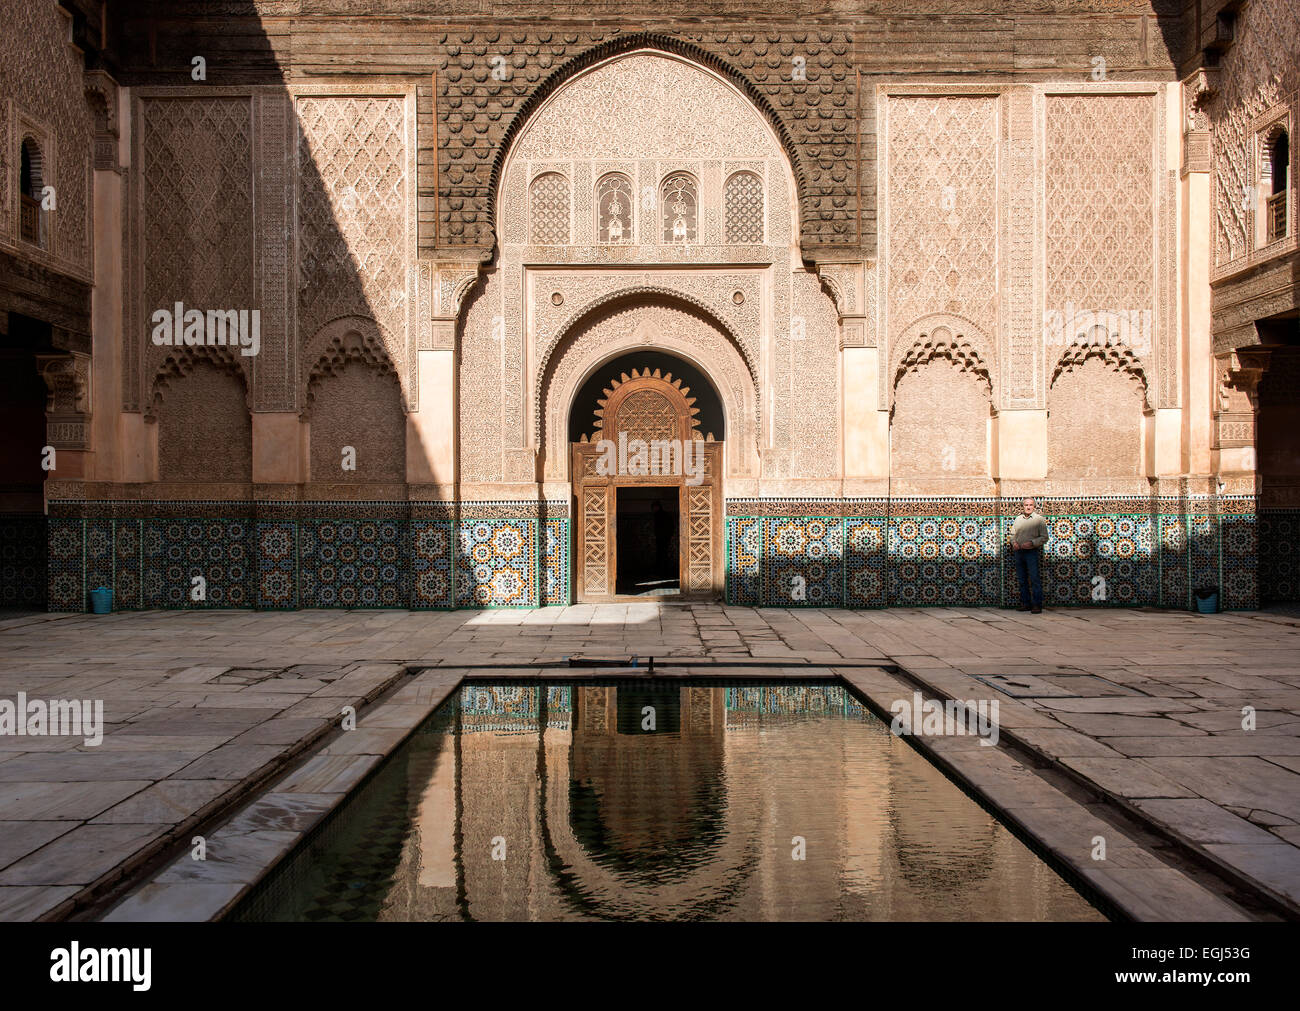 Courtyard of the Medersa Ben Youssef, Medina, Marrakech, Morocco - Stock Image